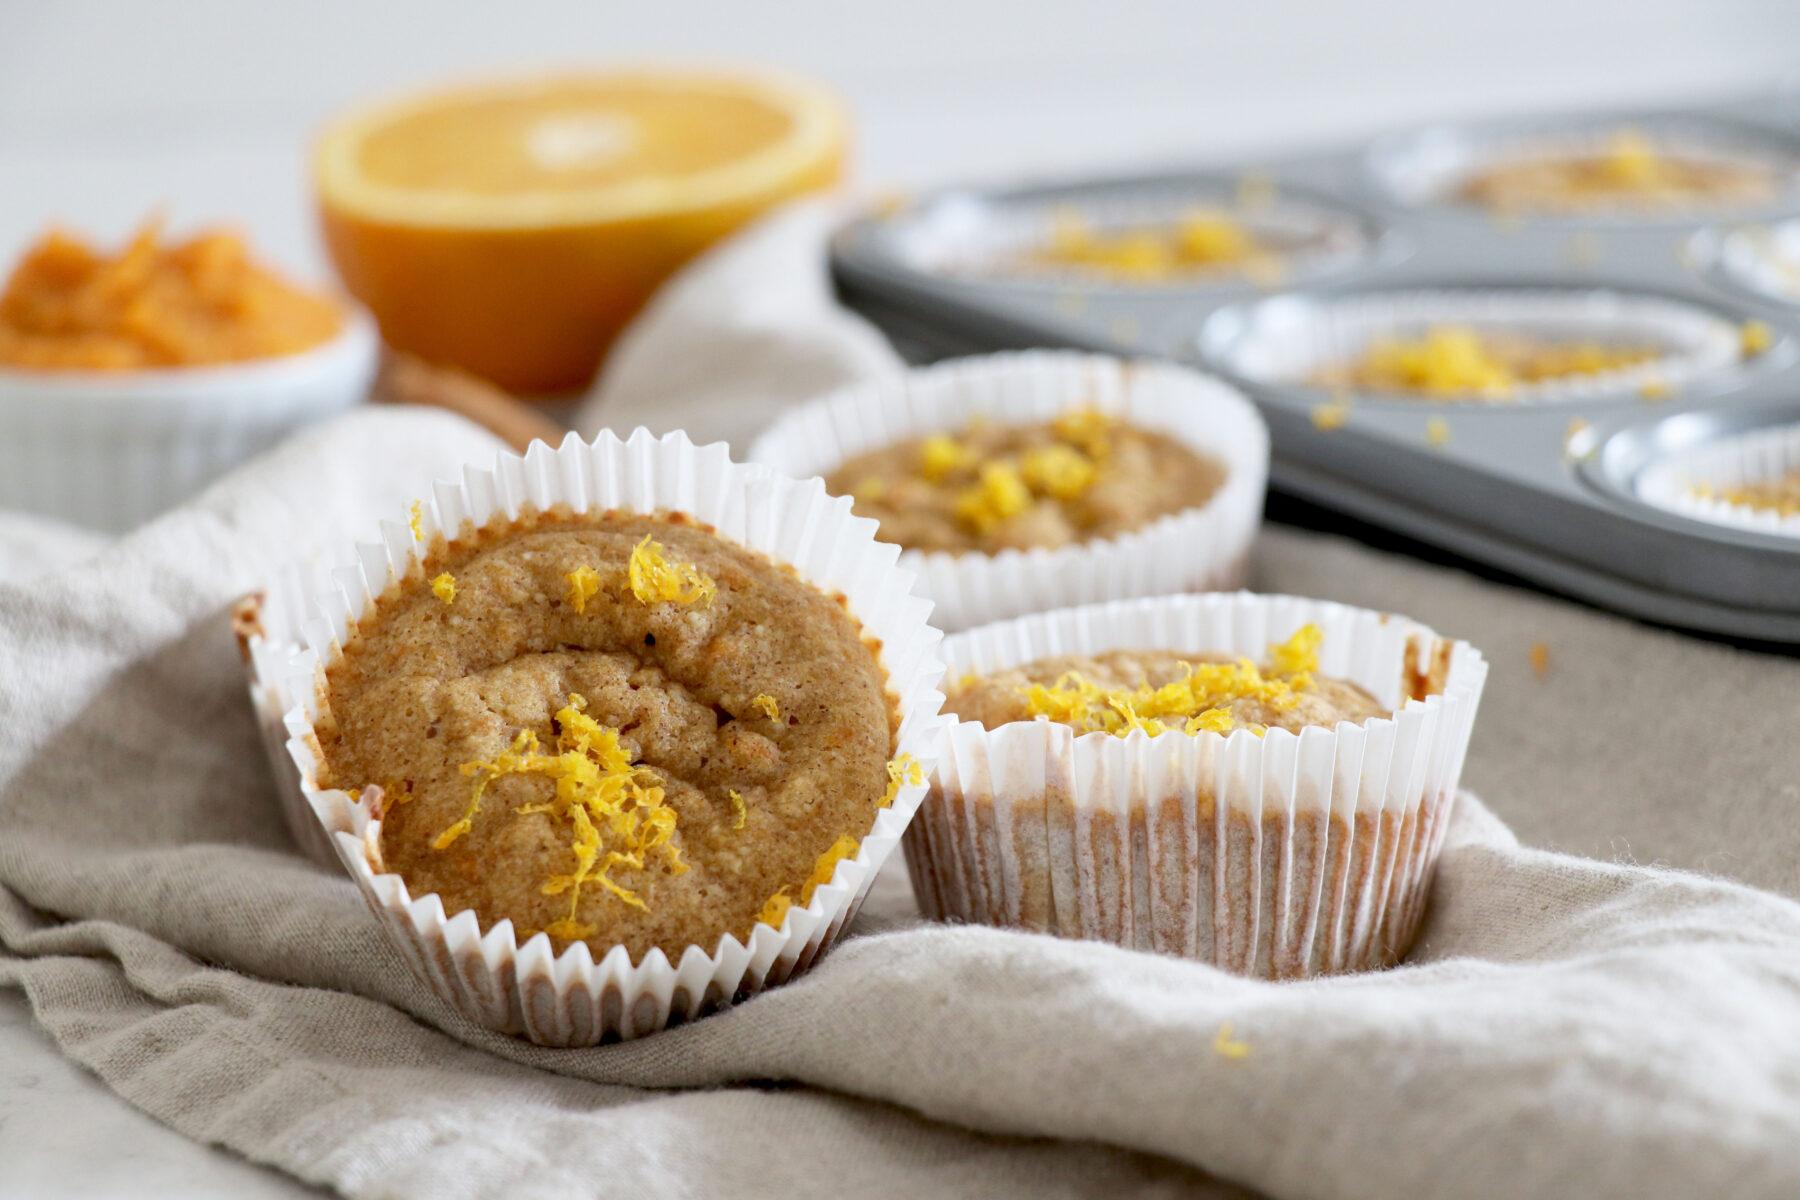 Orange cinnamon muffins with muffin tin behind and sliced orange.